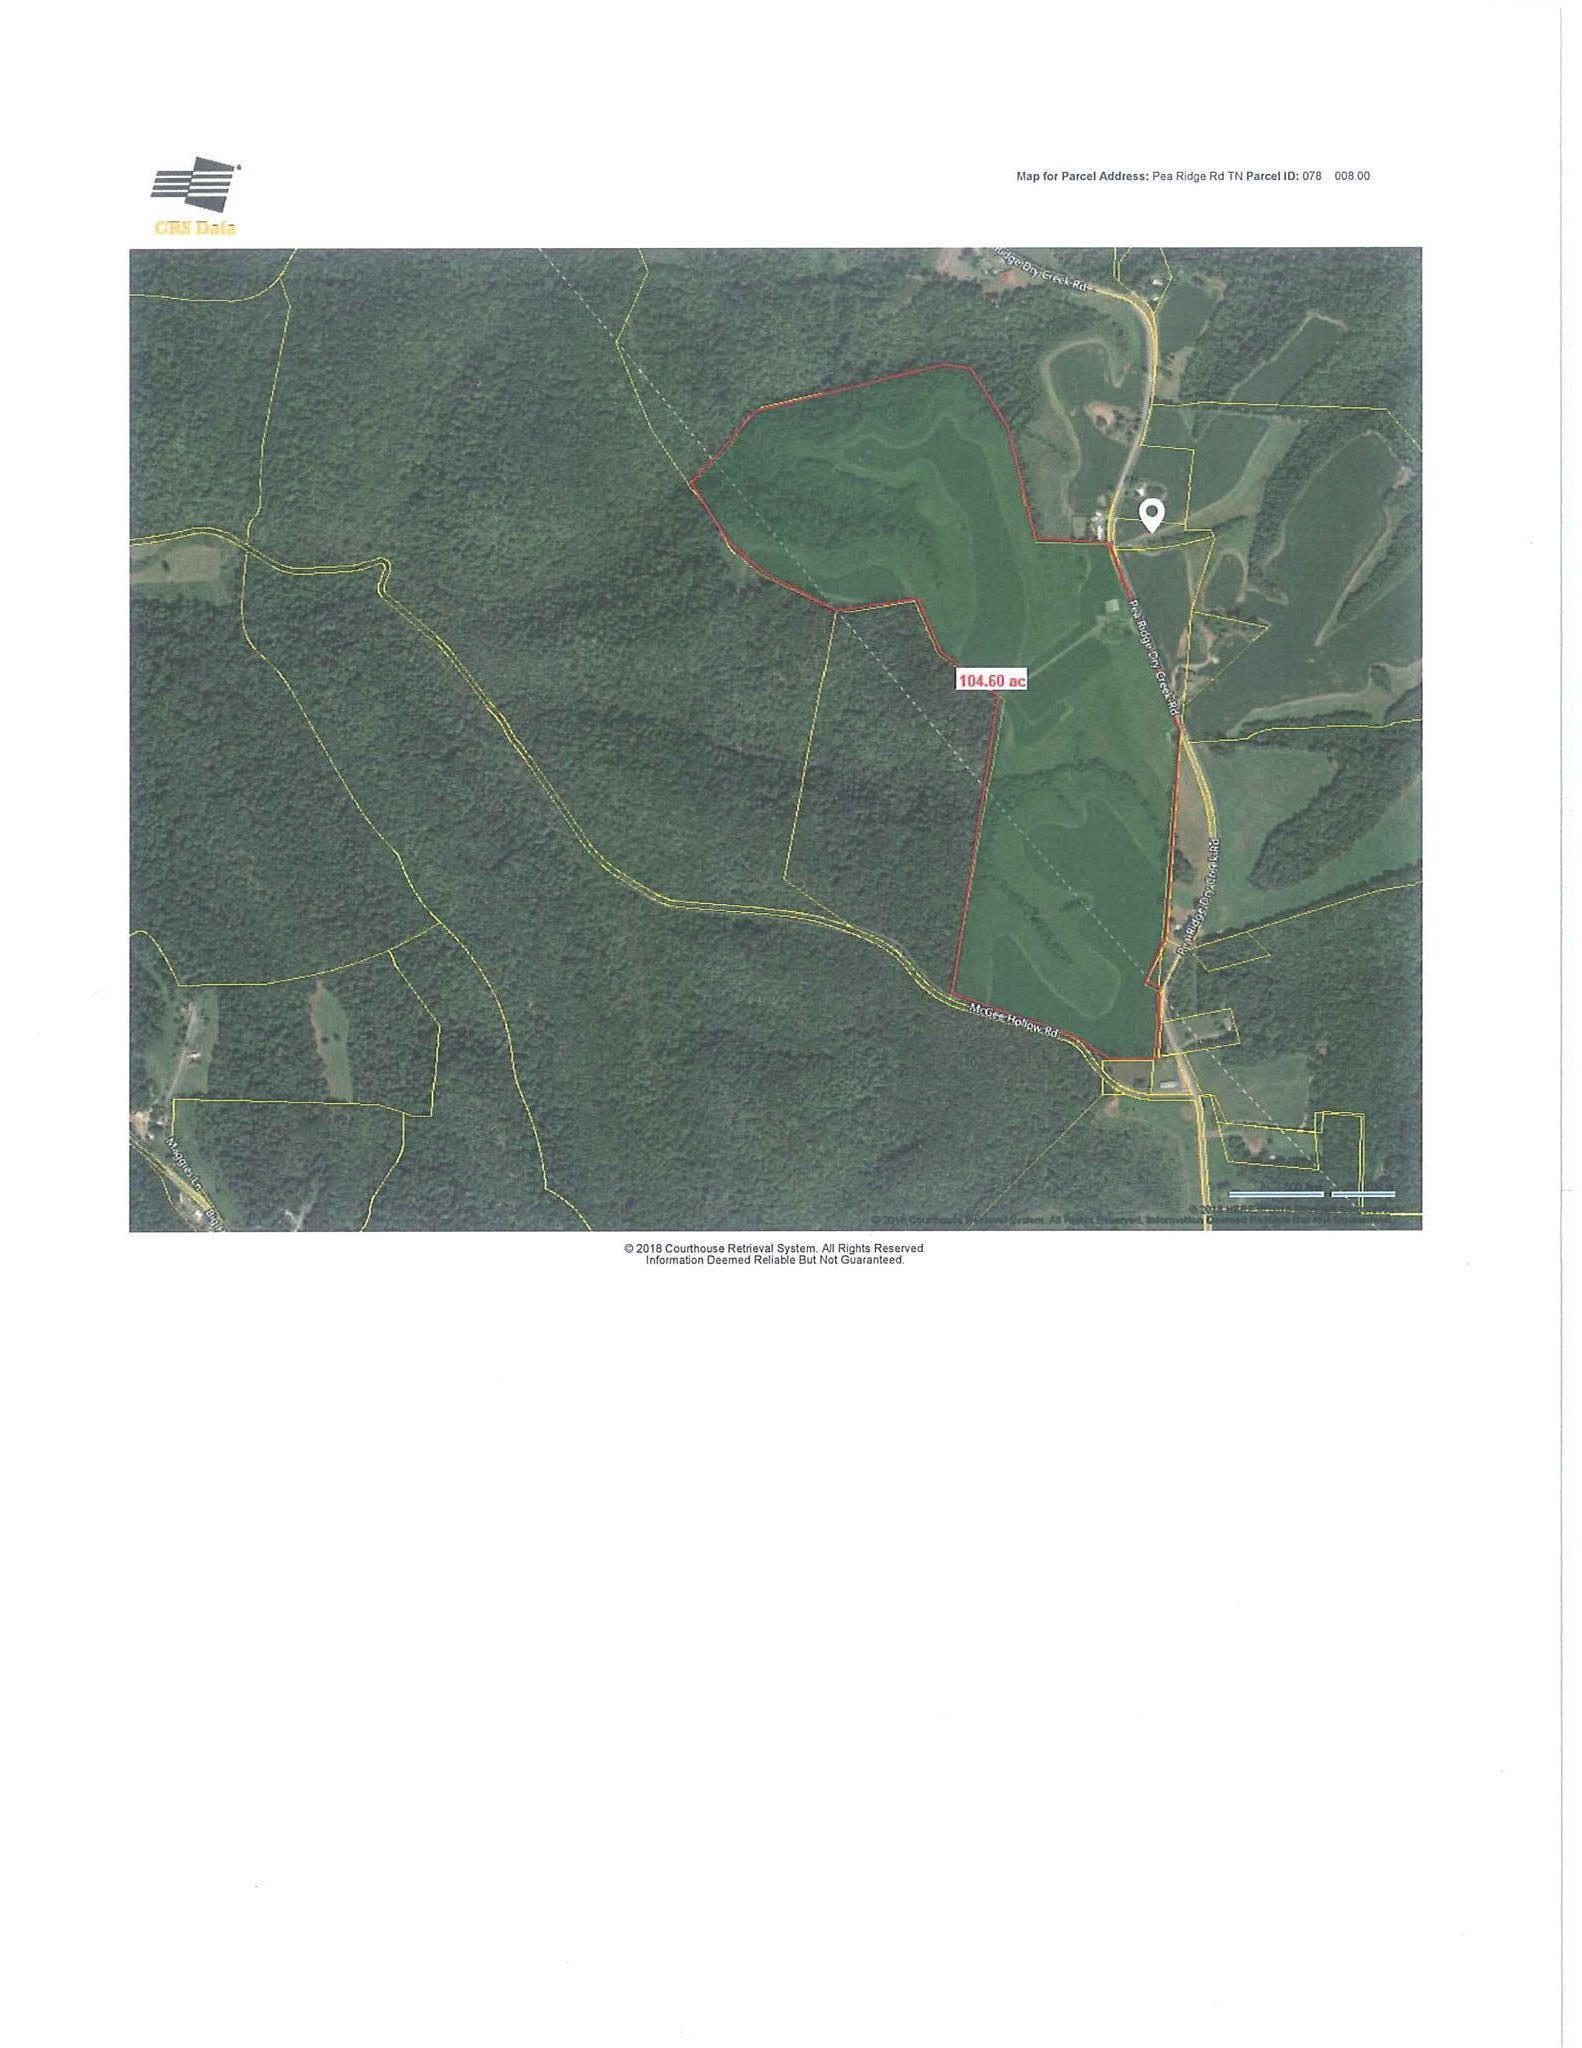 3145 Pea Ridge Rd, Liberty, TN 37095 - Liberty, TN real estate listing